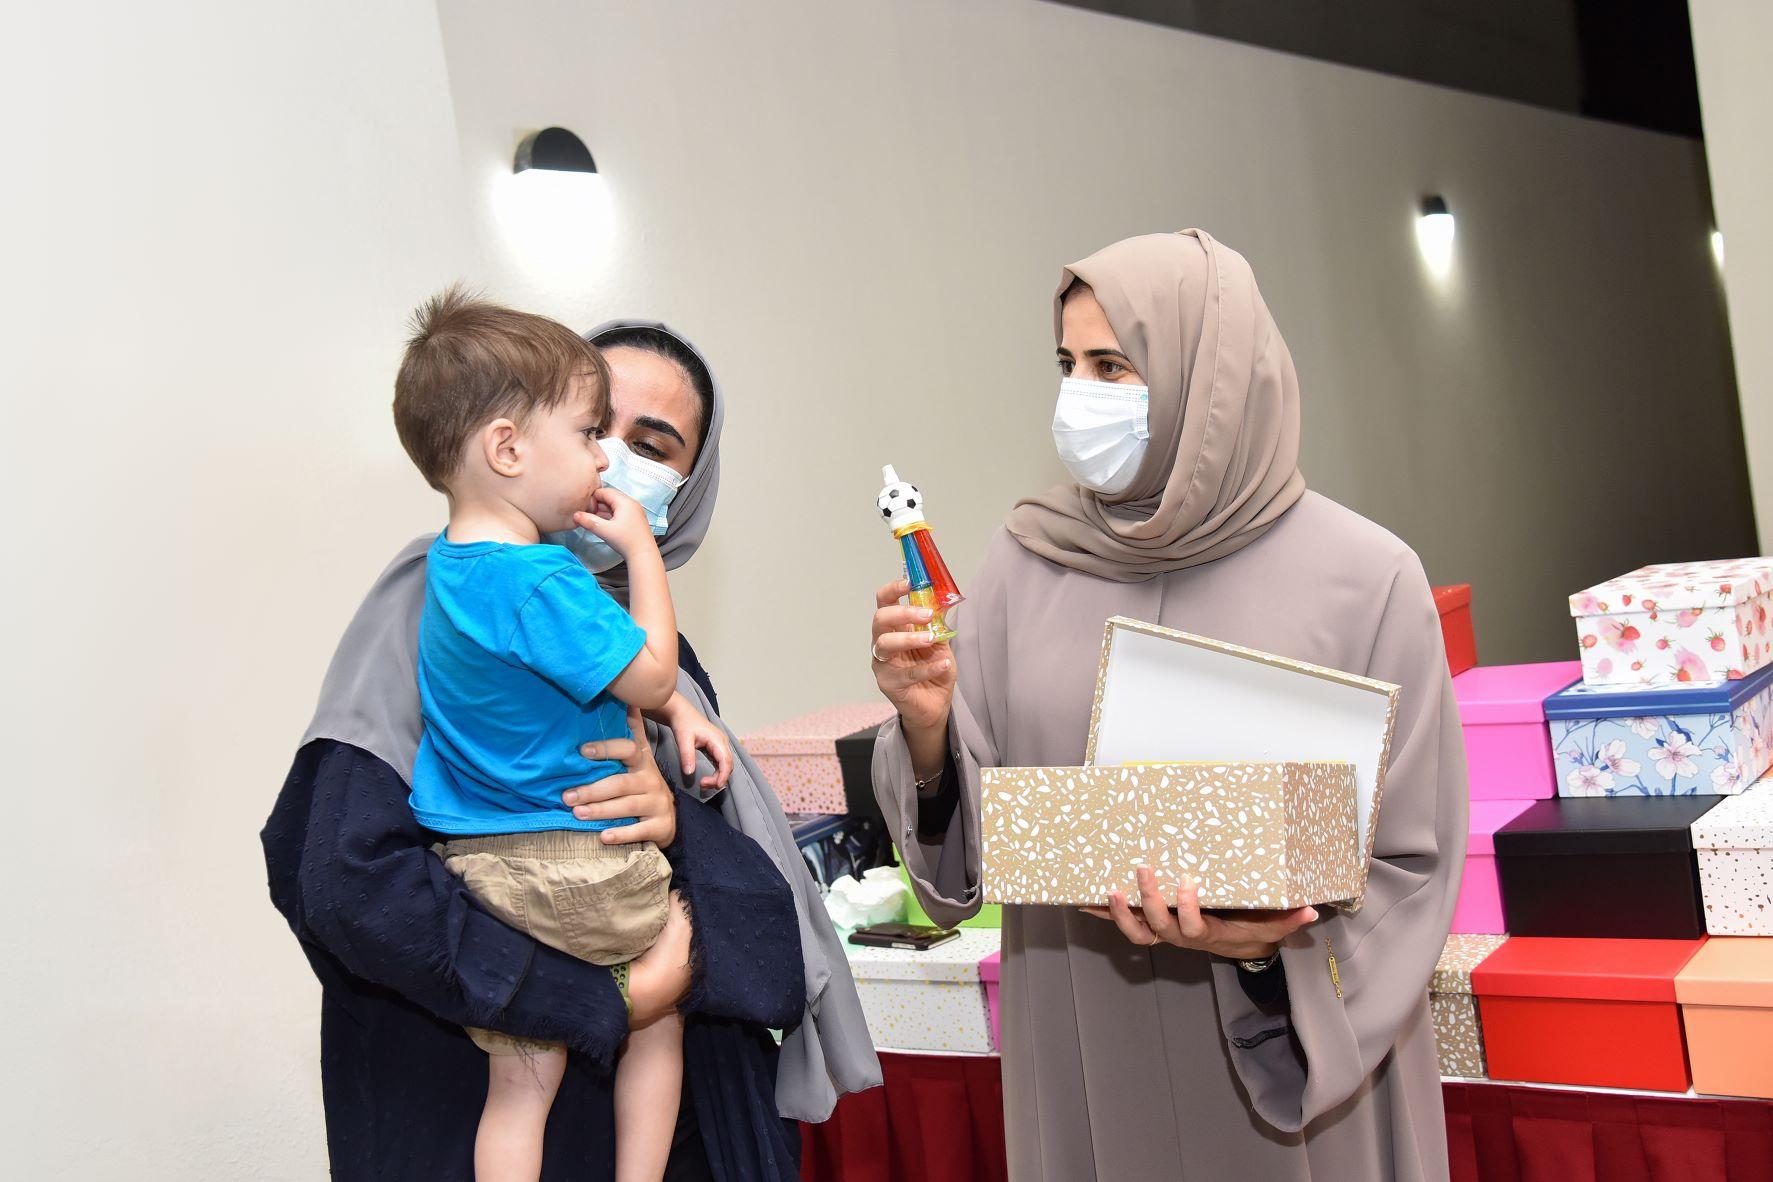 Qatar Facilitates Evacuation of 40,000 People Safely from Kabul